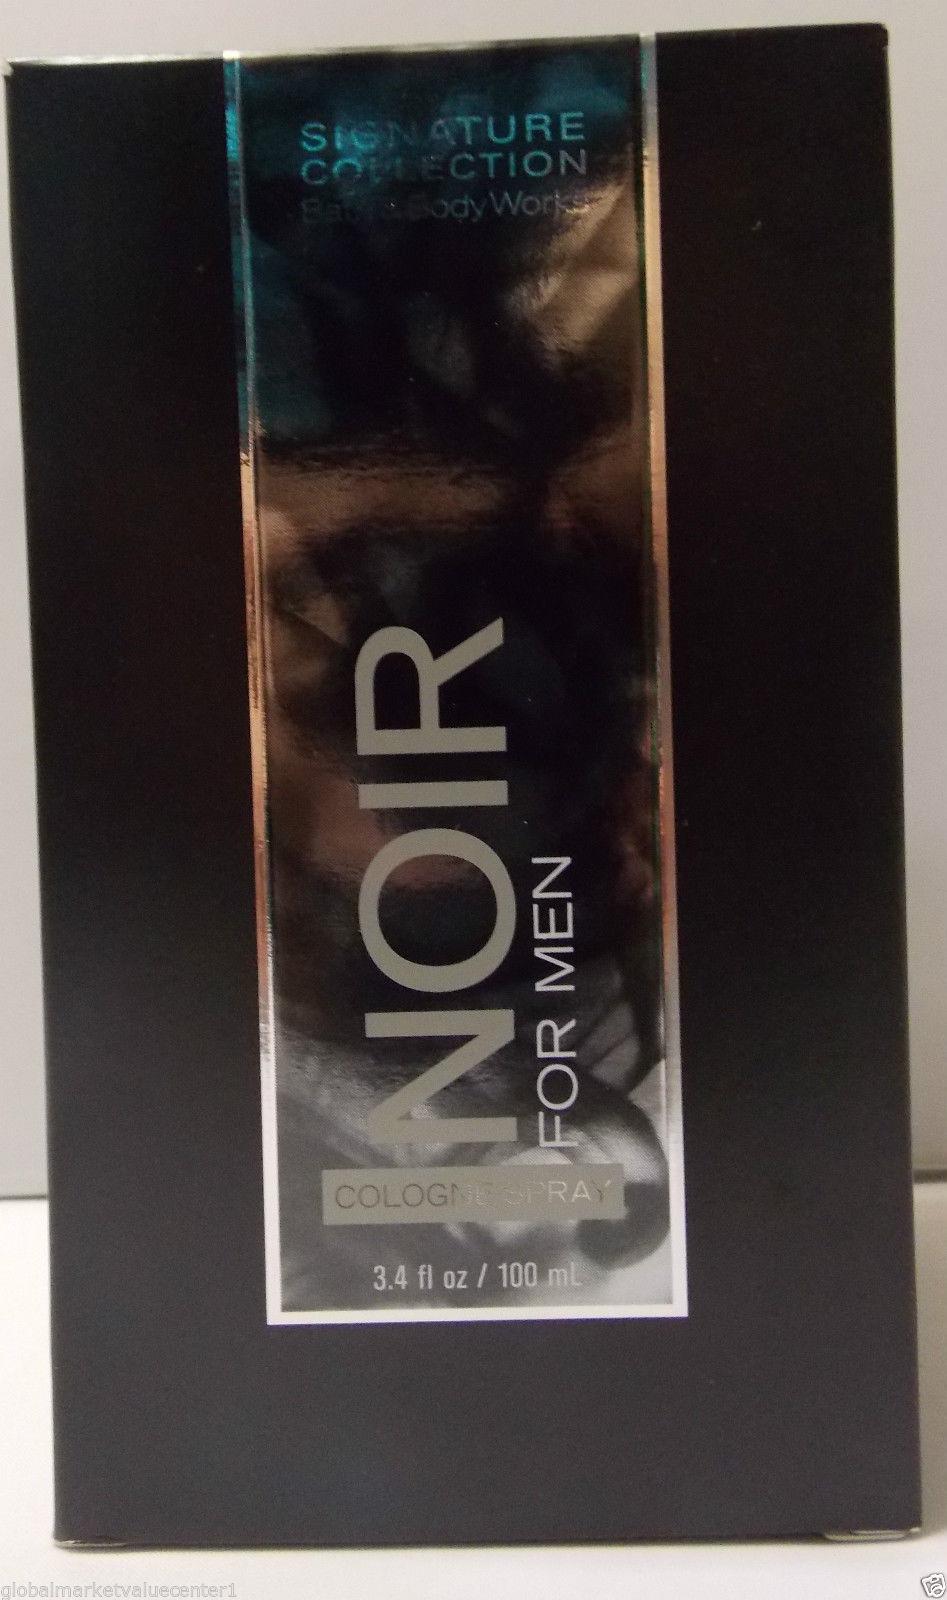 Bath & Body Works Noir for Men 3.4 oz Cologne Spray